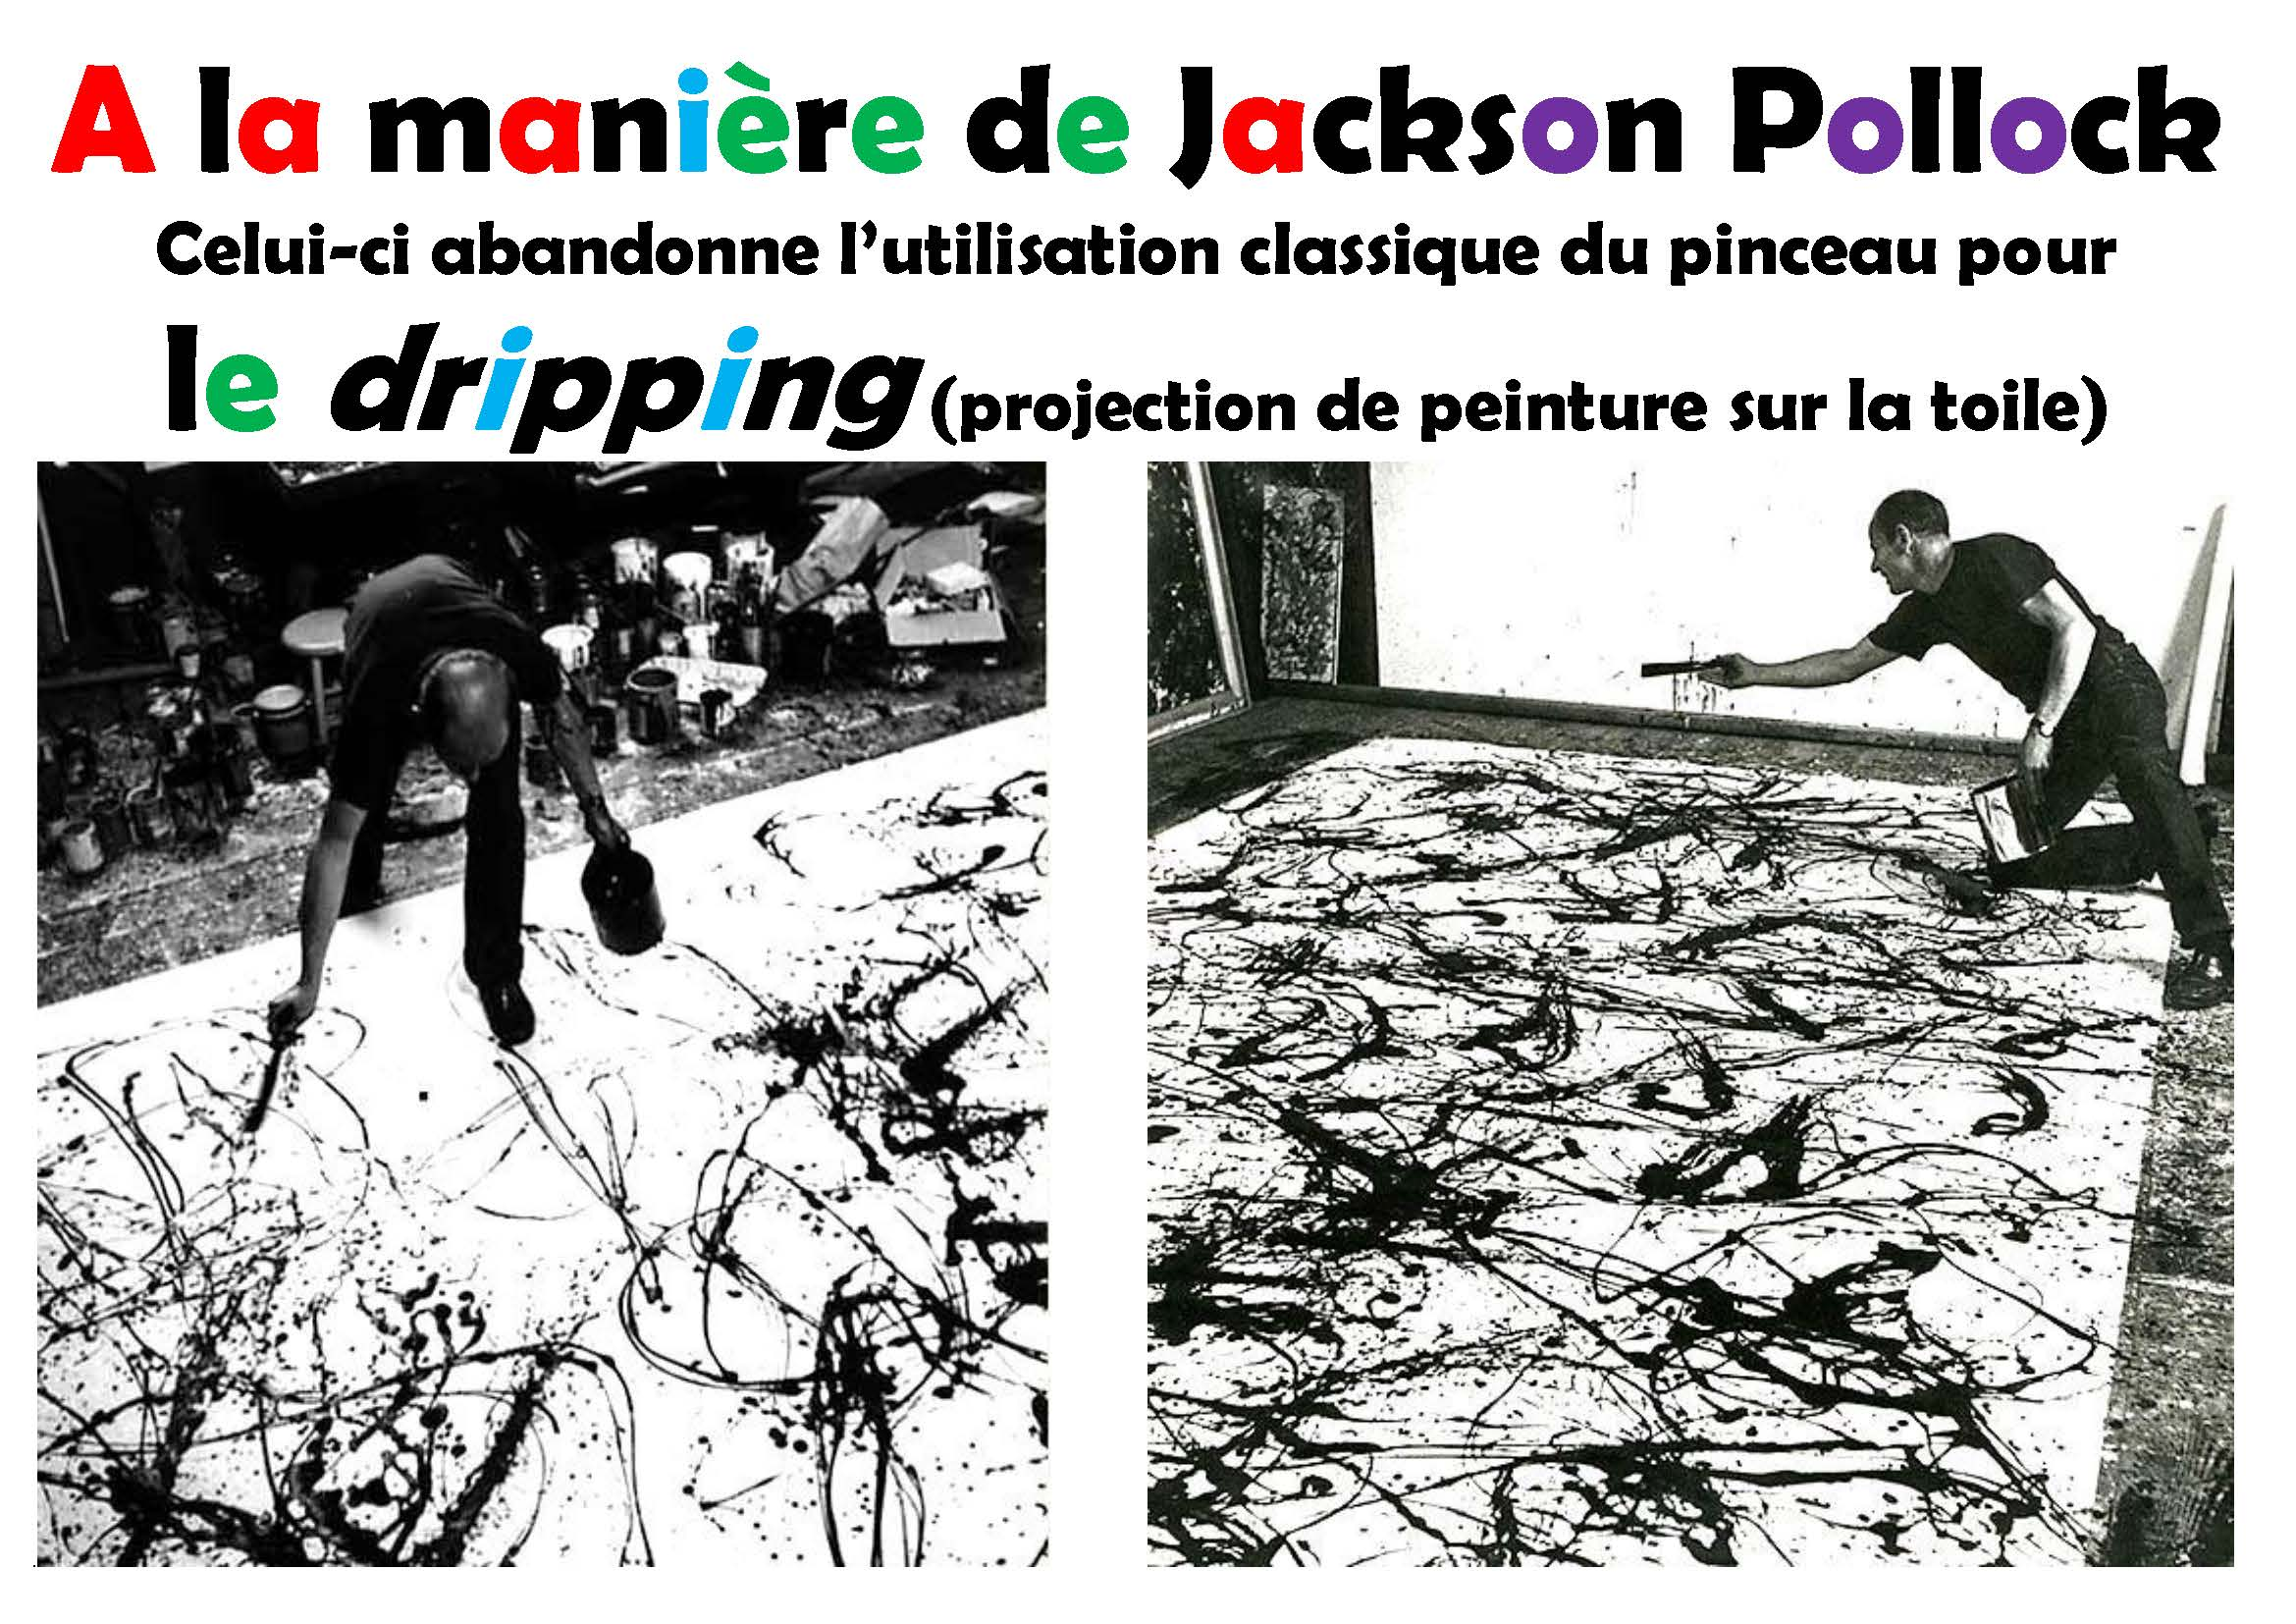 Les Gsd2 Decouvrent Pollock